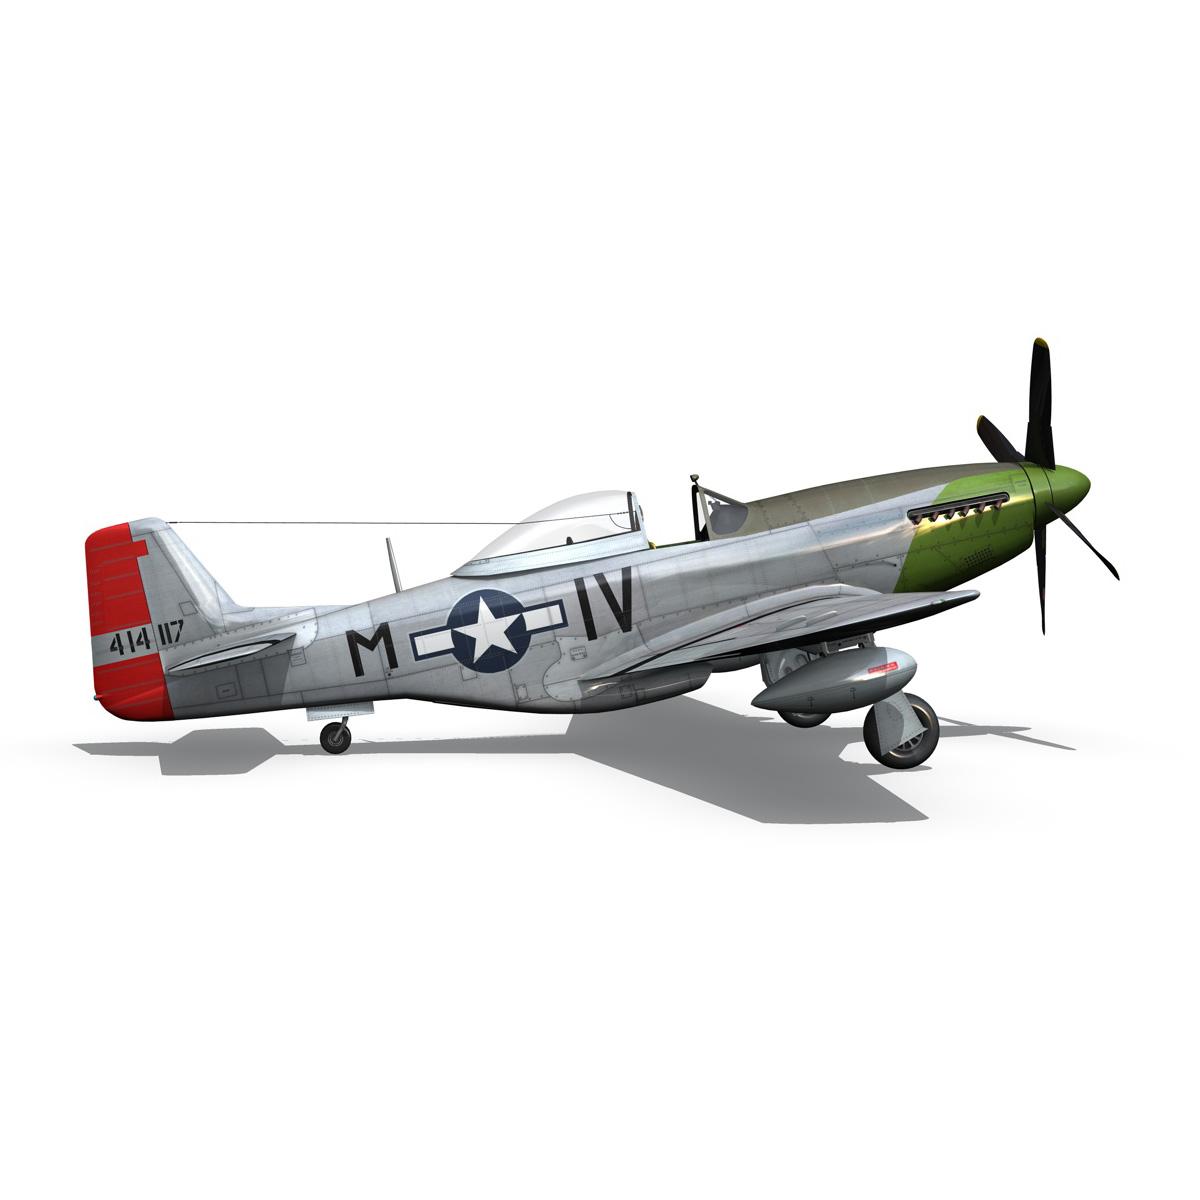 north american p-51d mustang – stinky 3d model fbx c4d lwo obj 269609